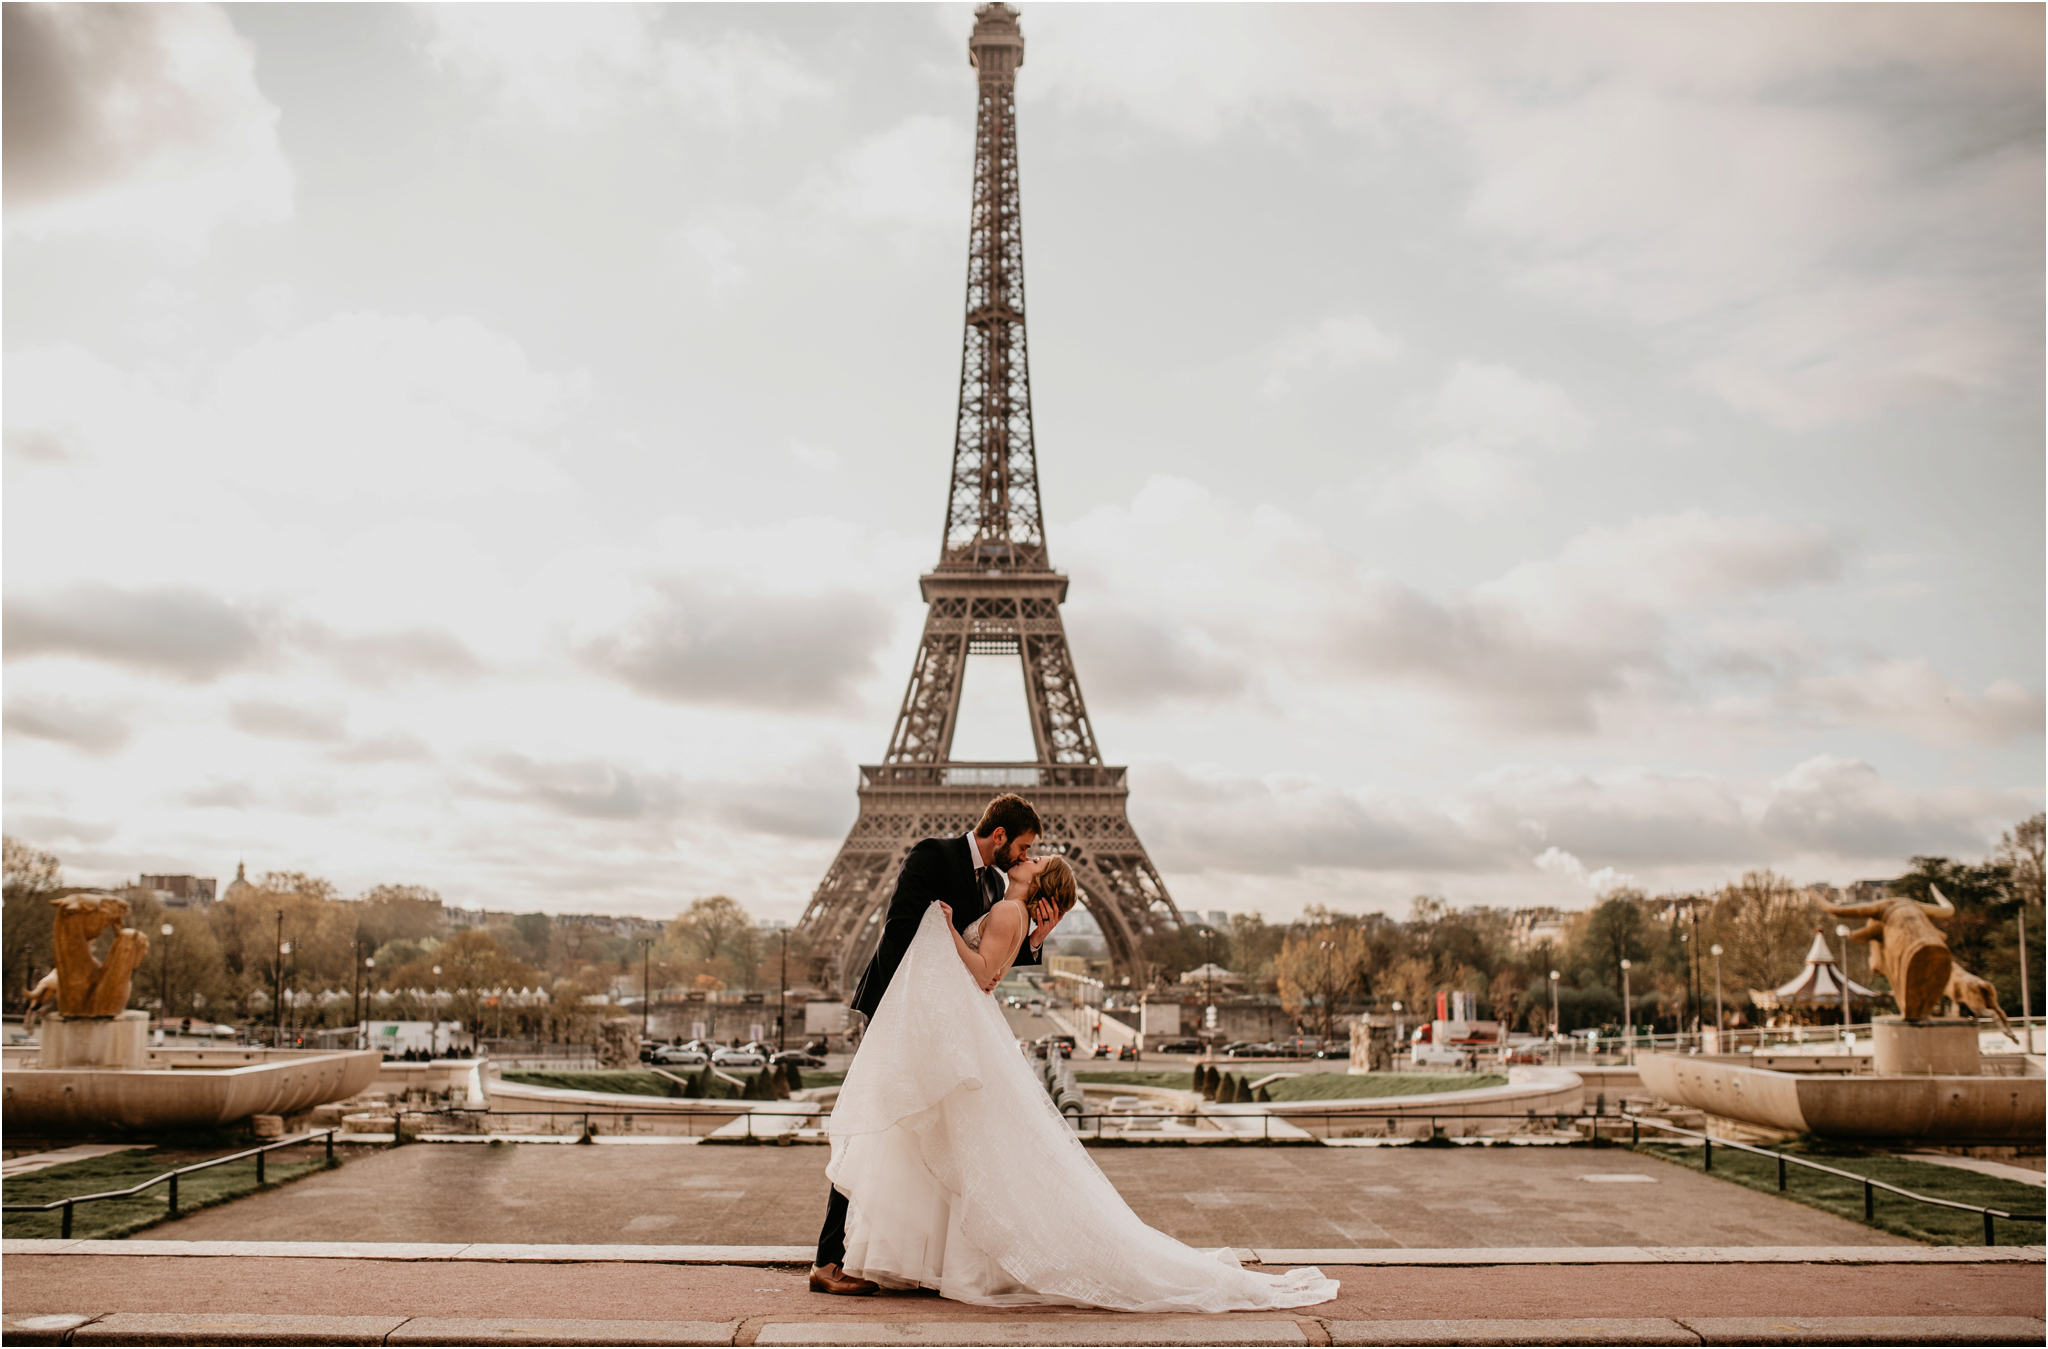 miranda-and-jared-paris-elopement-destination-wedding-photographer-051.jpg